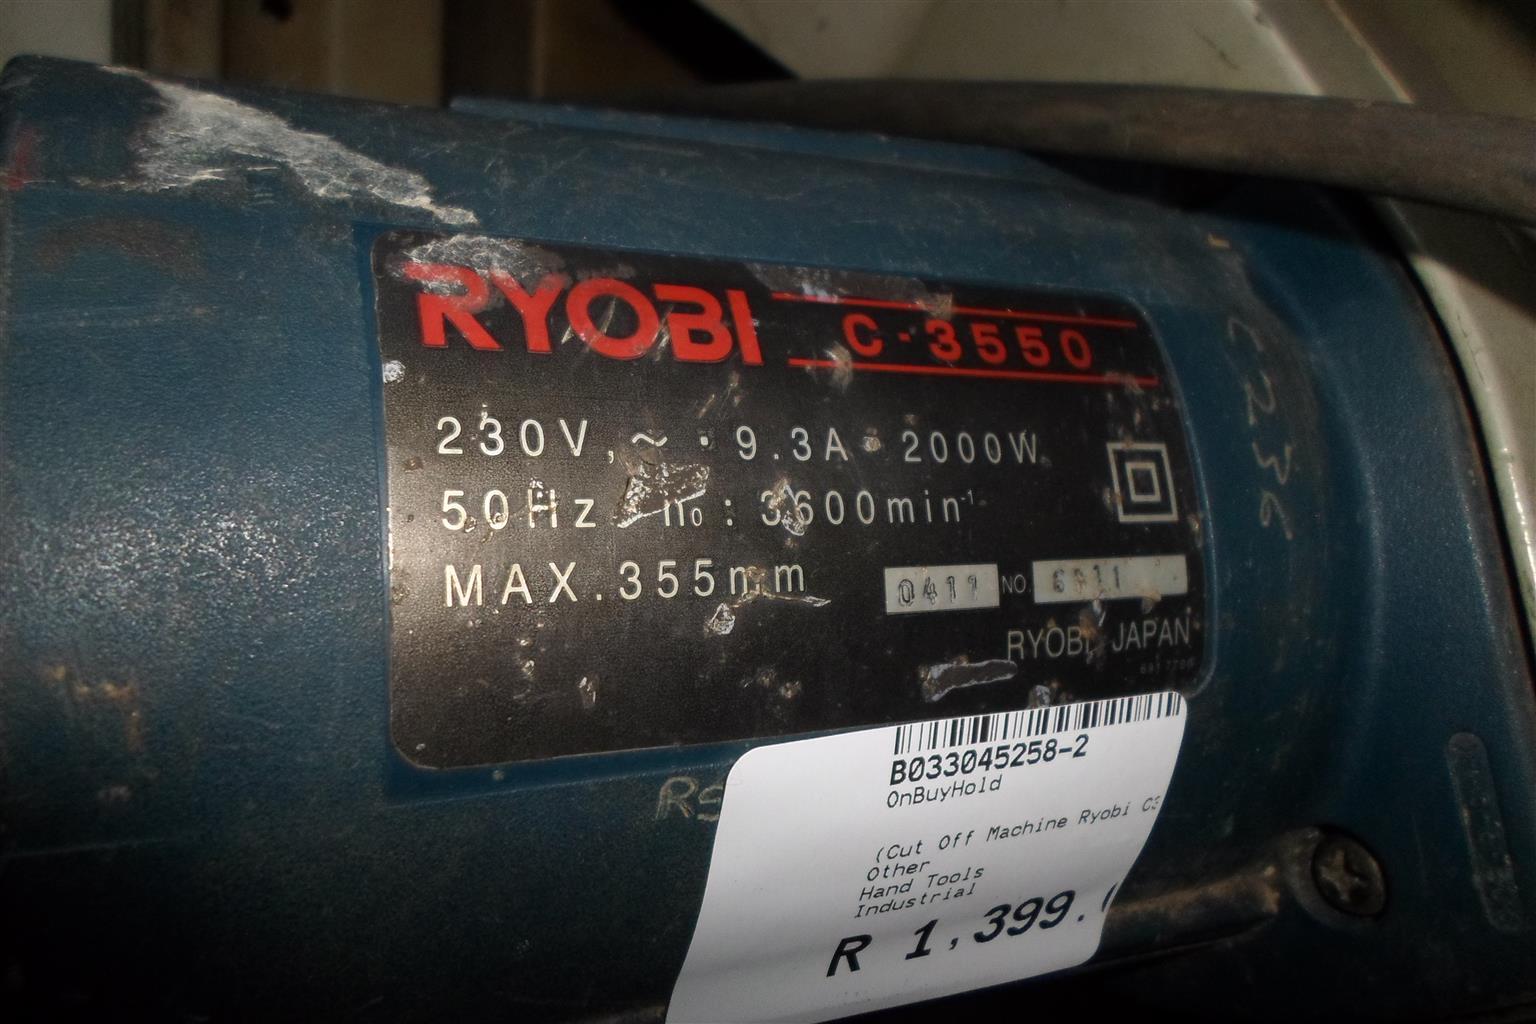 2000W Ryobi C-3550 Cut Off Machine